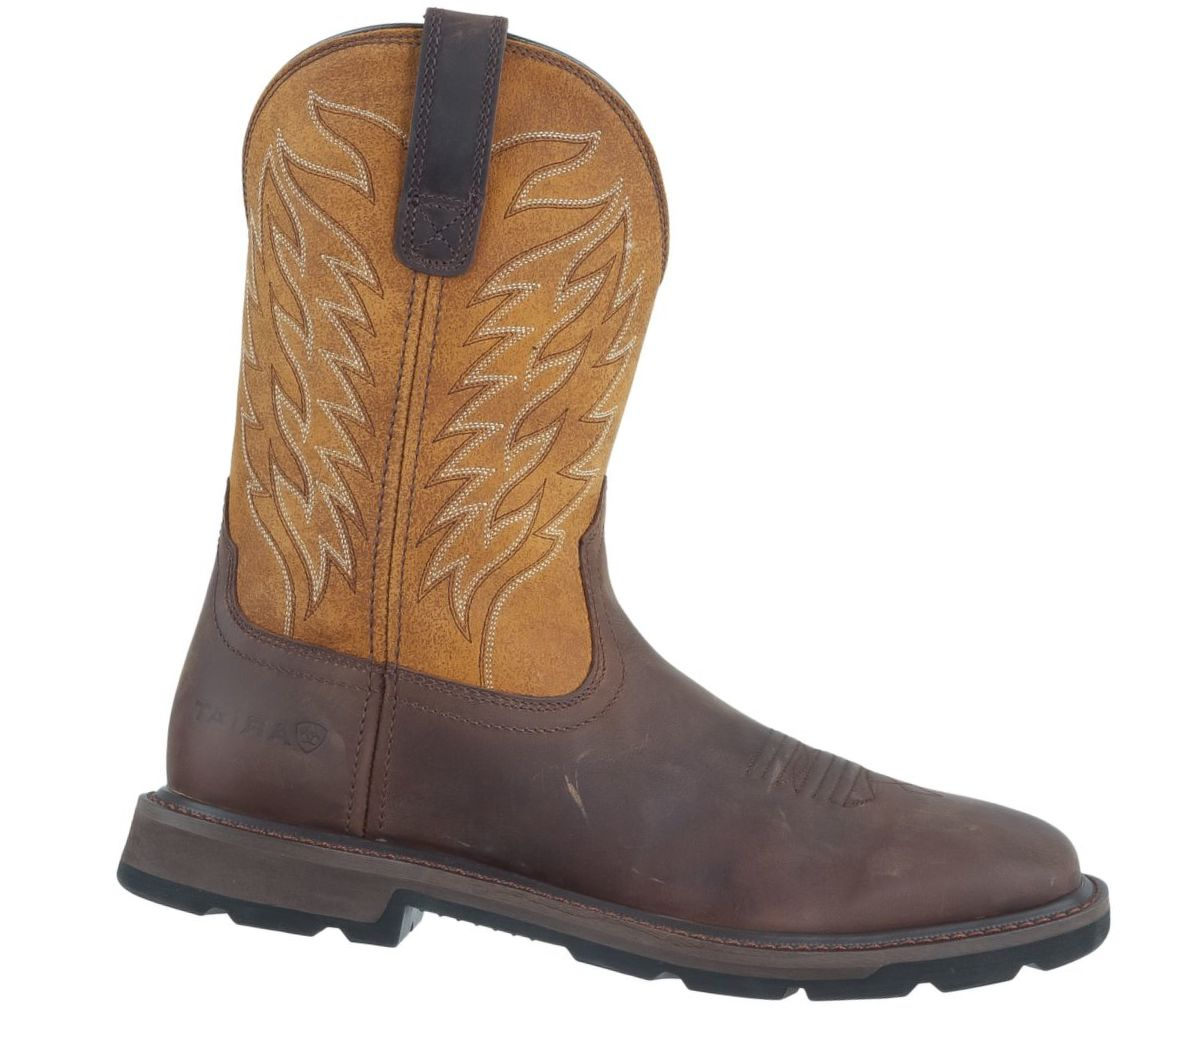 Ariat® Men's Dalton Square-Toe Western Work Boots